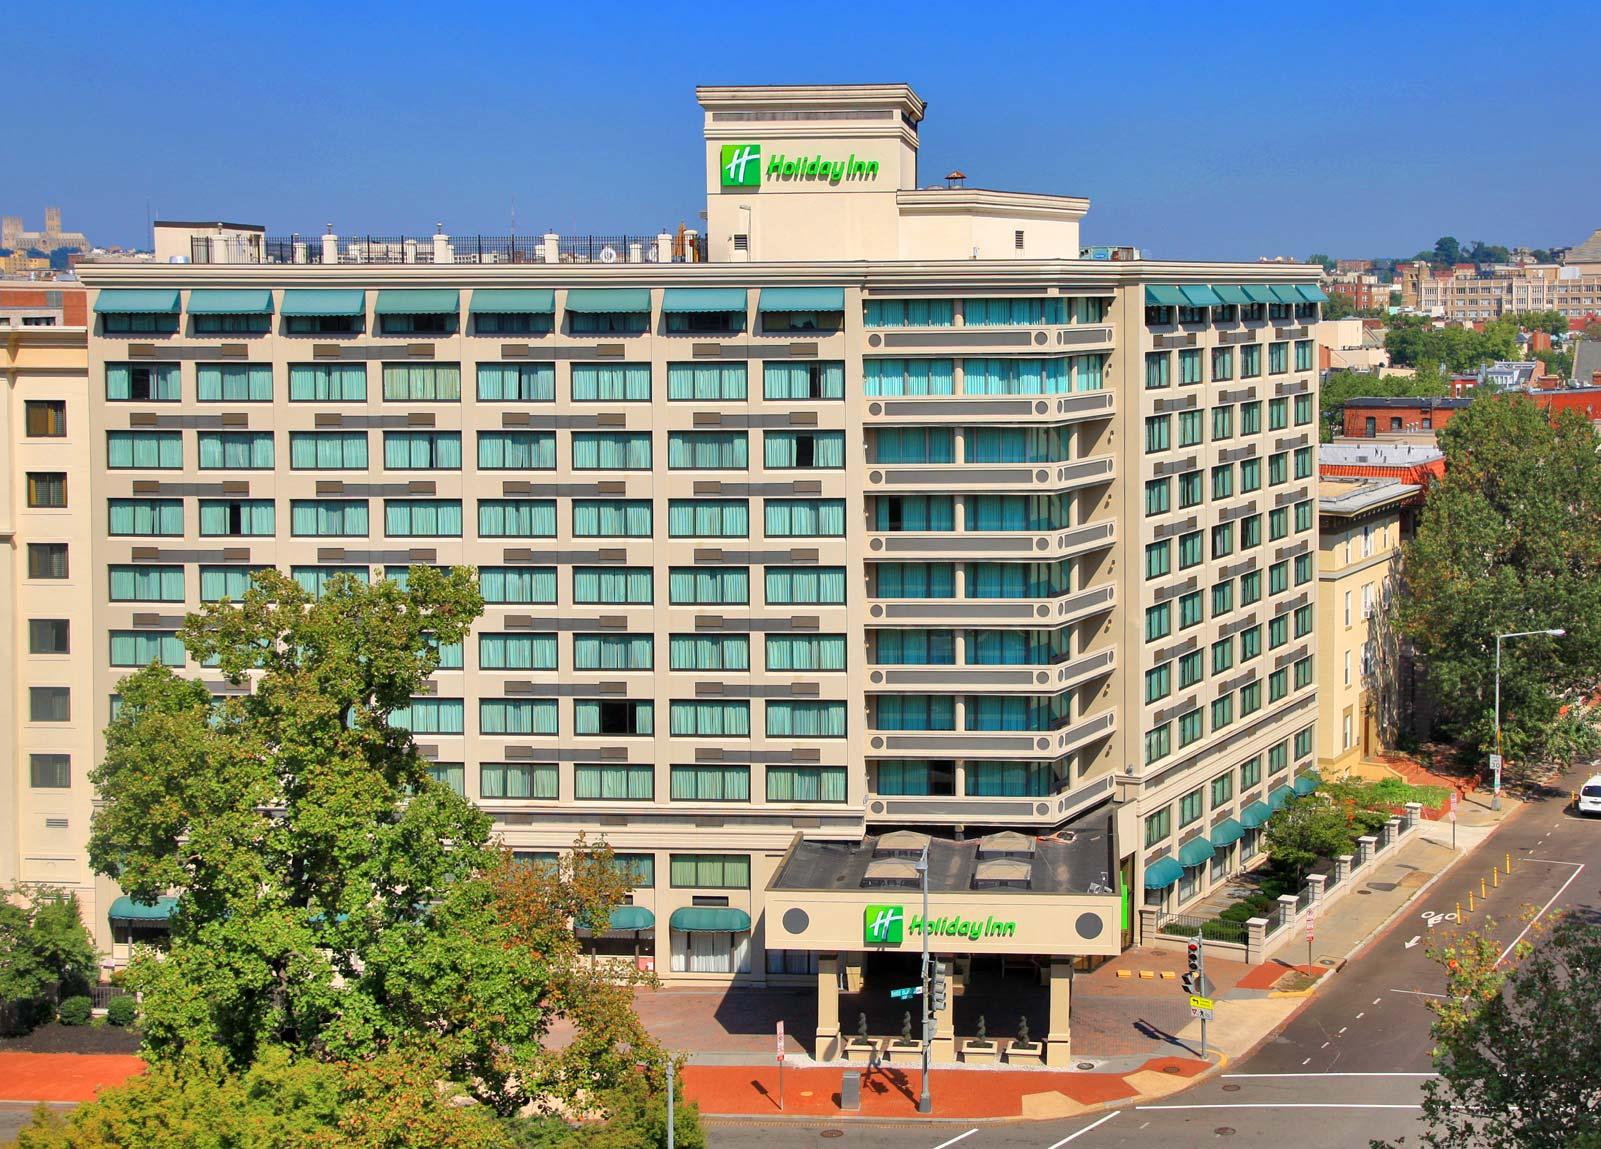 Holiday Inn Washington Dc